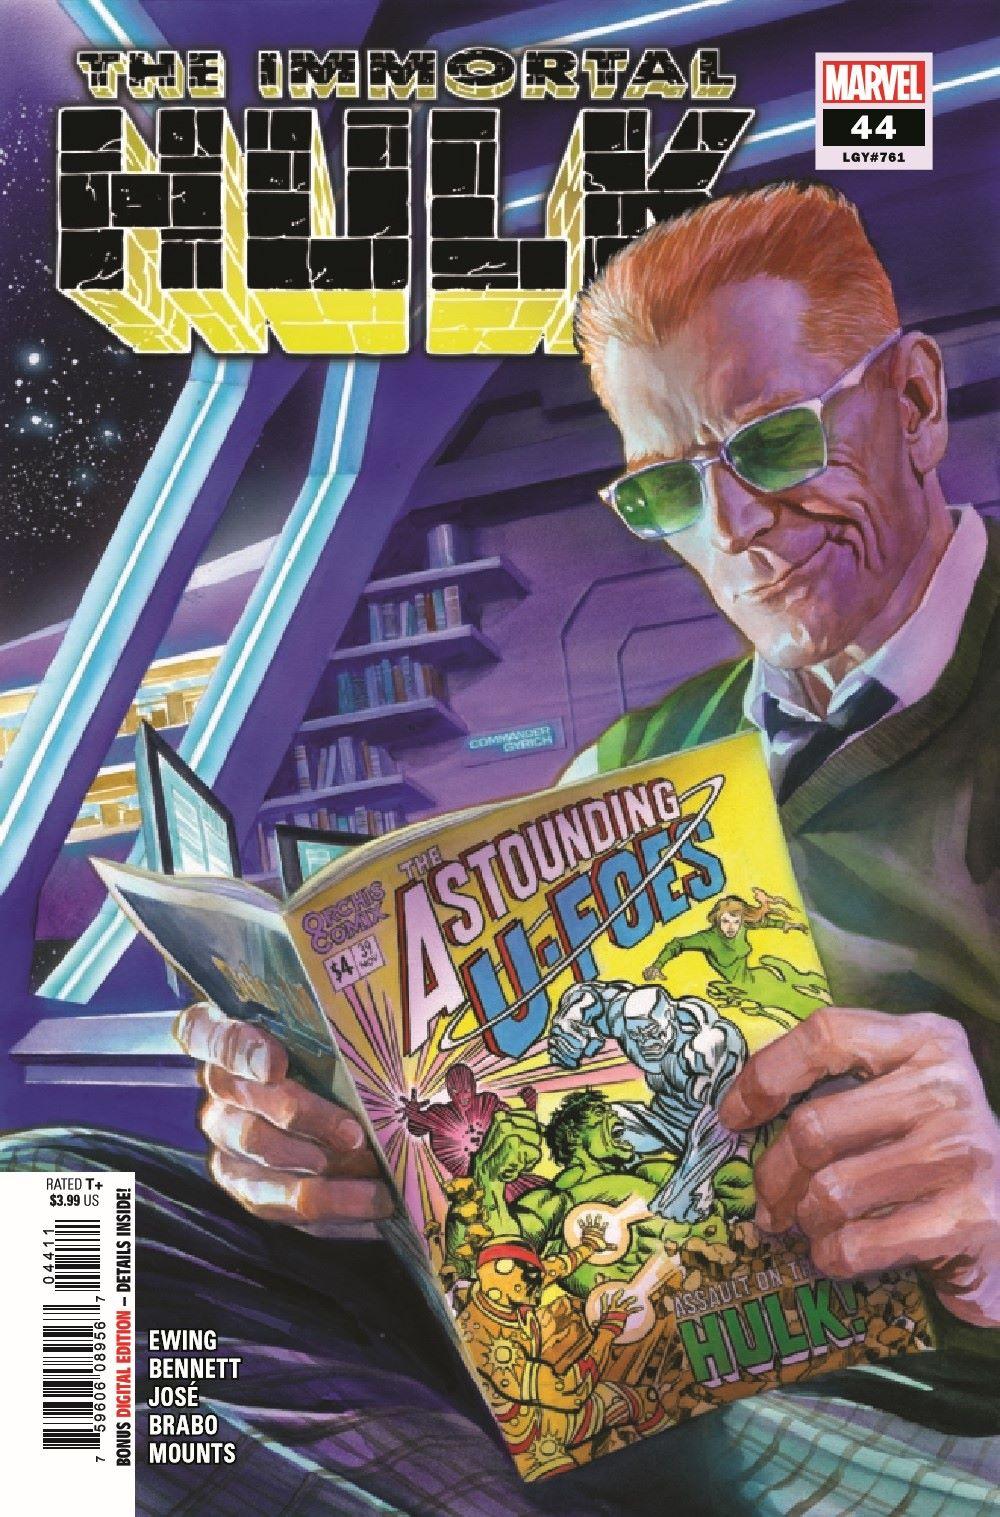 HULK2018044_Preview-1 ComicList Previews: THE IMMORTAL HULK #44